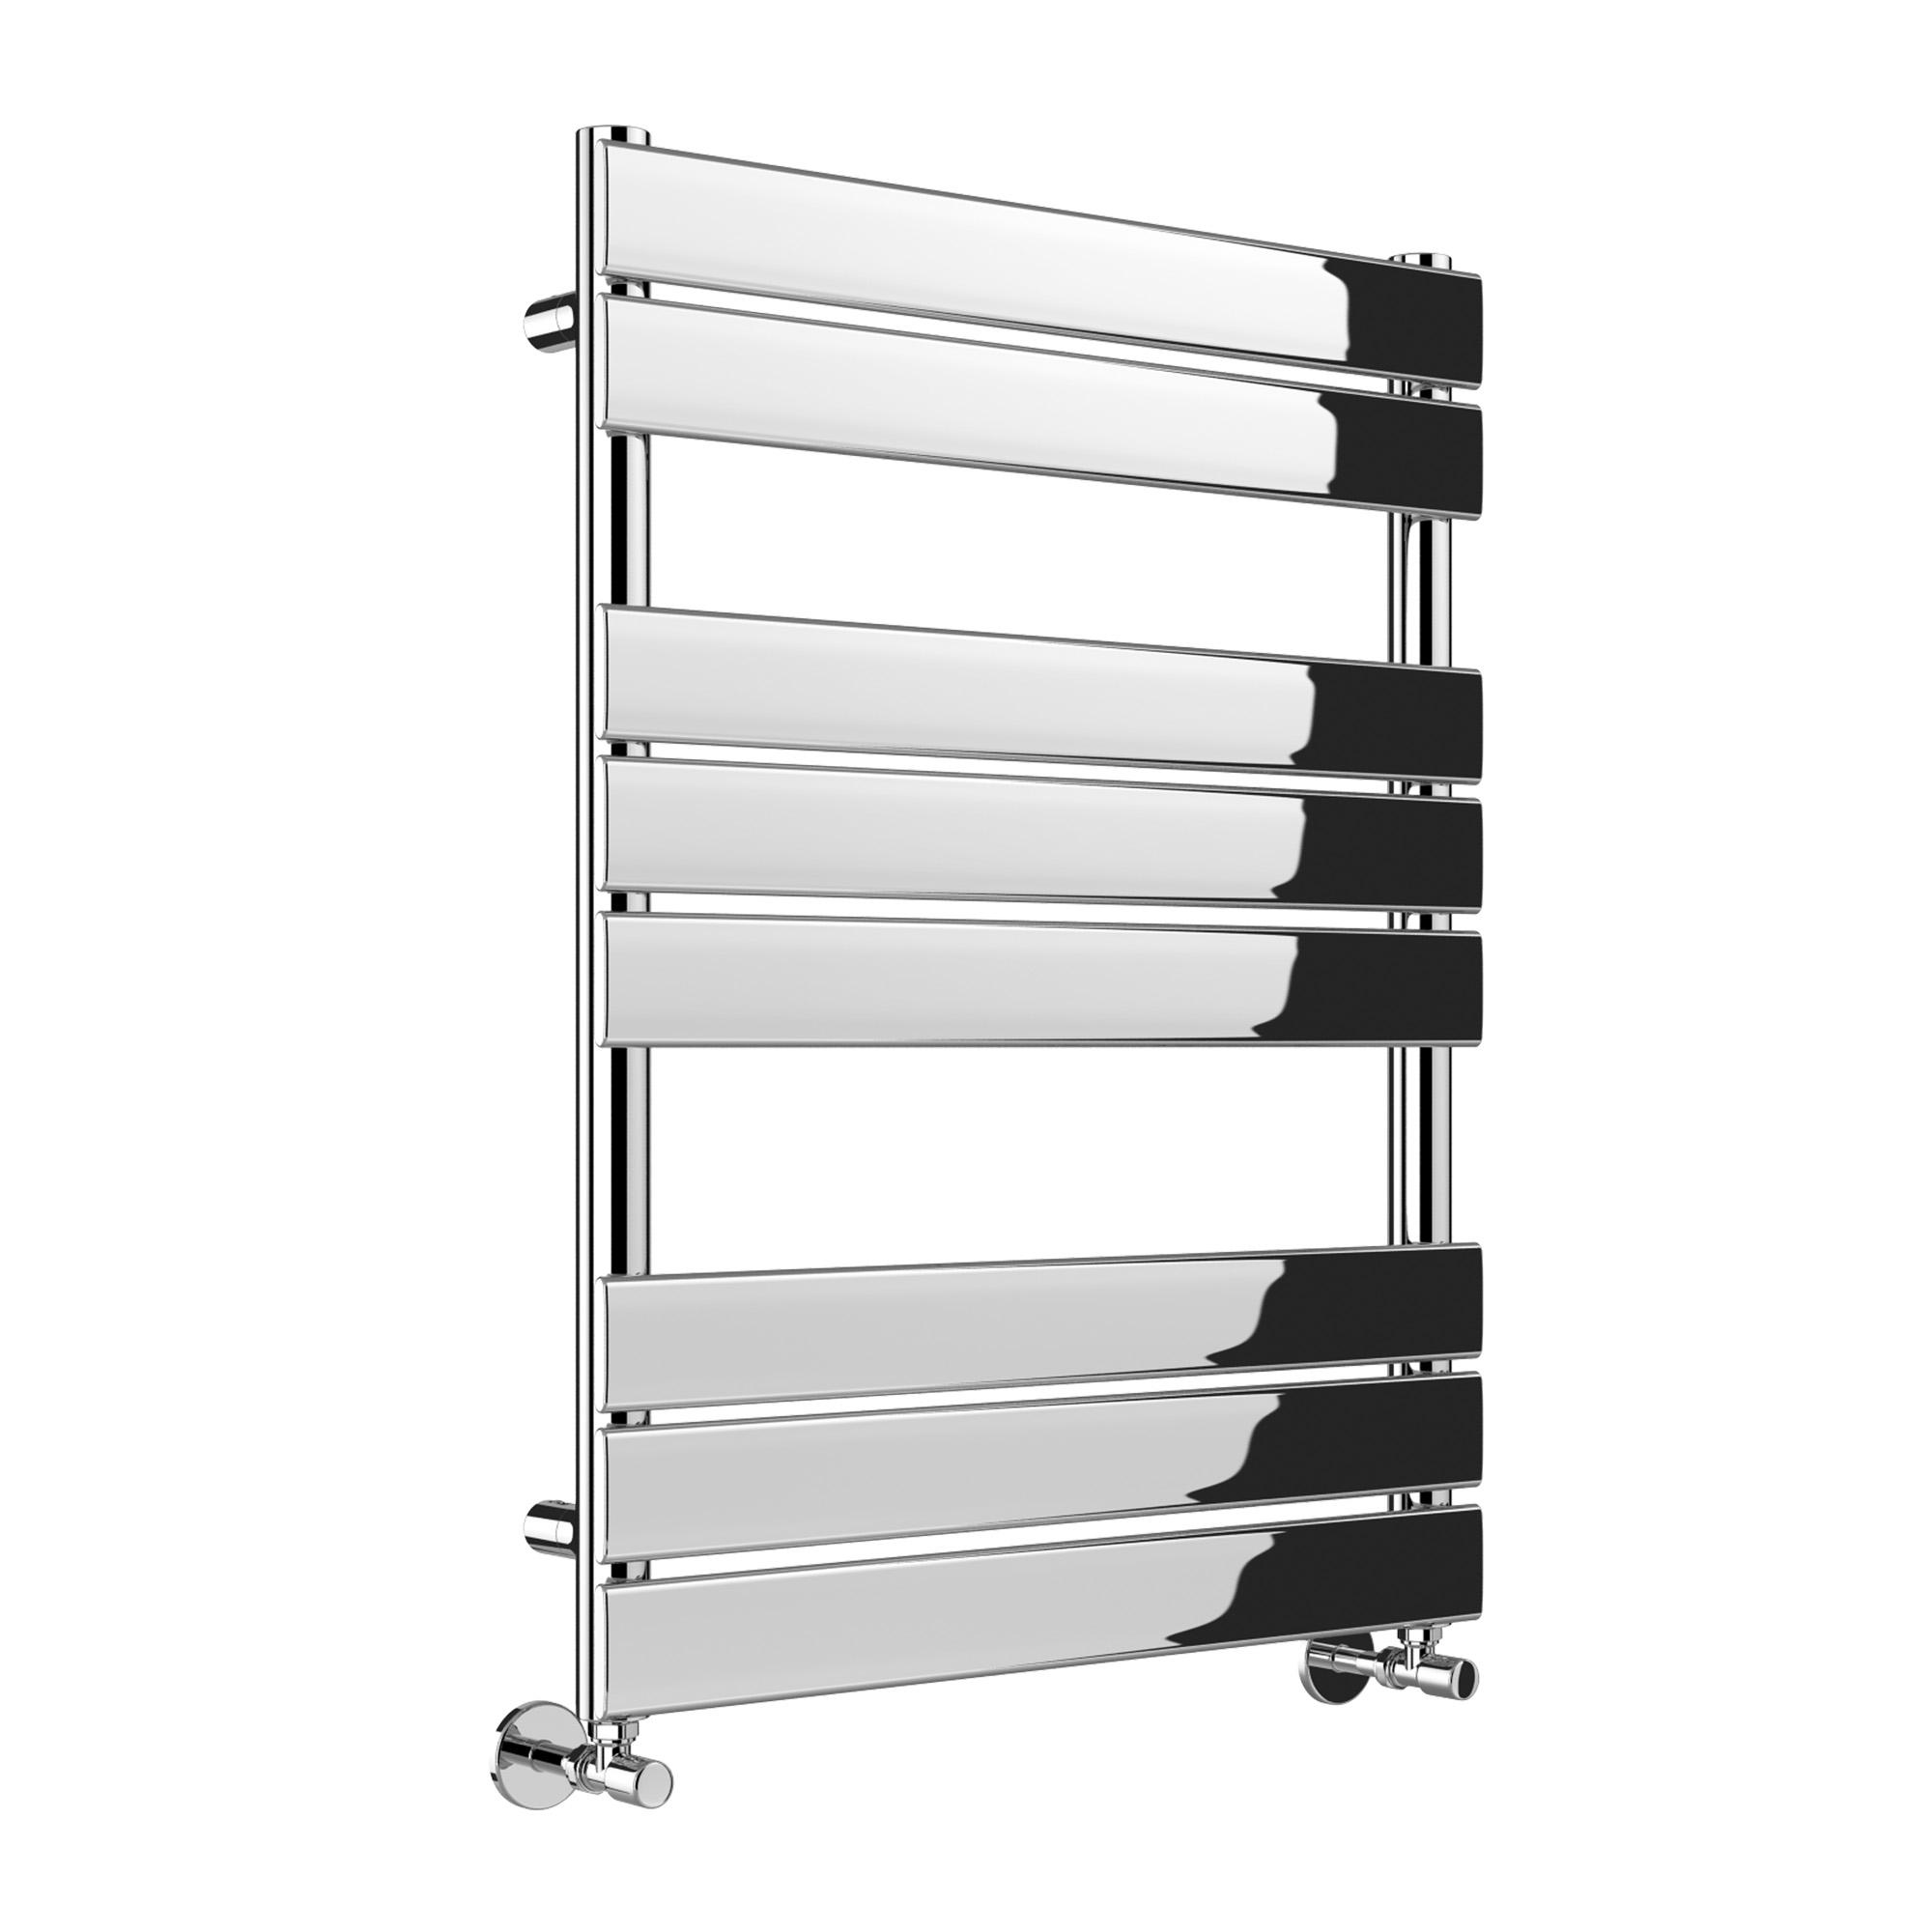 Heated Towel Rail Vertical: Vertical Designer Flat Panel Chrome Heated Towel Rail